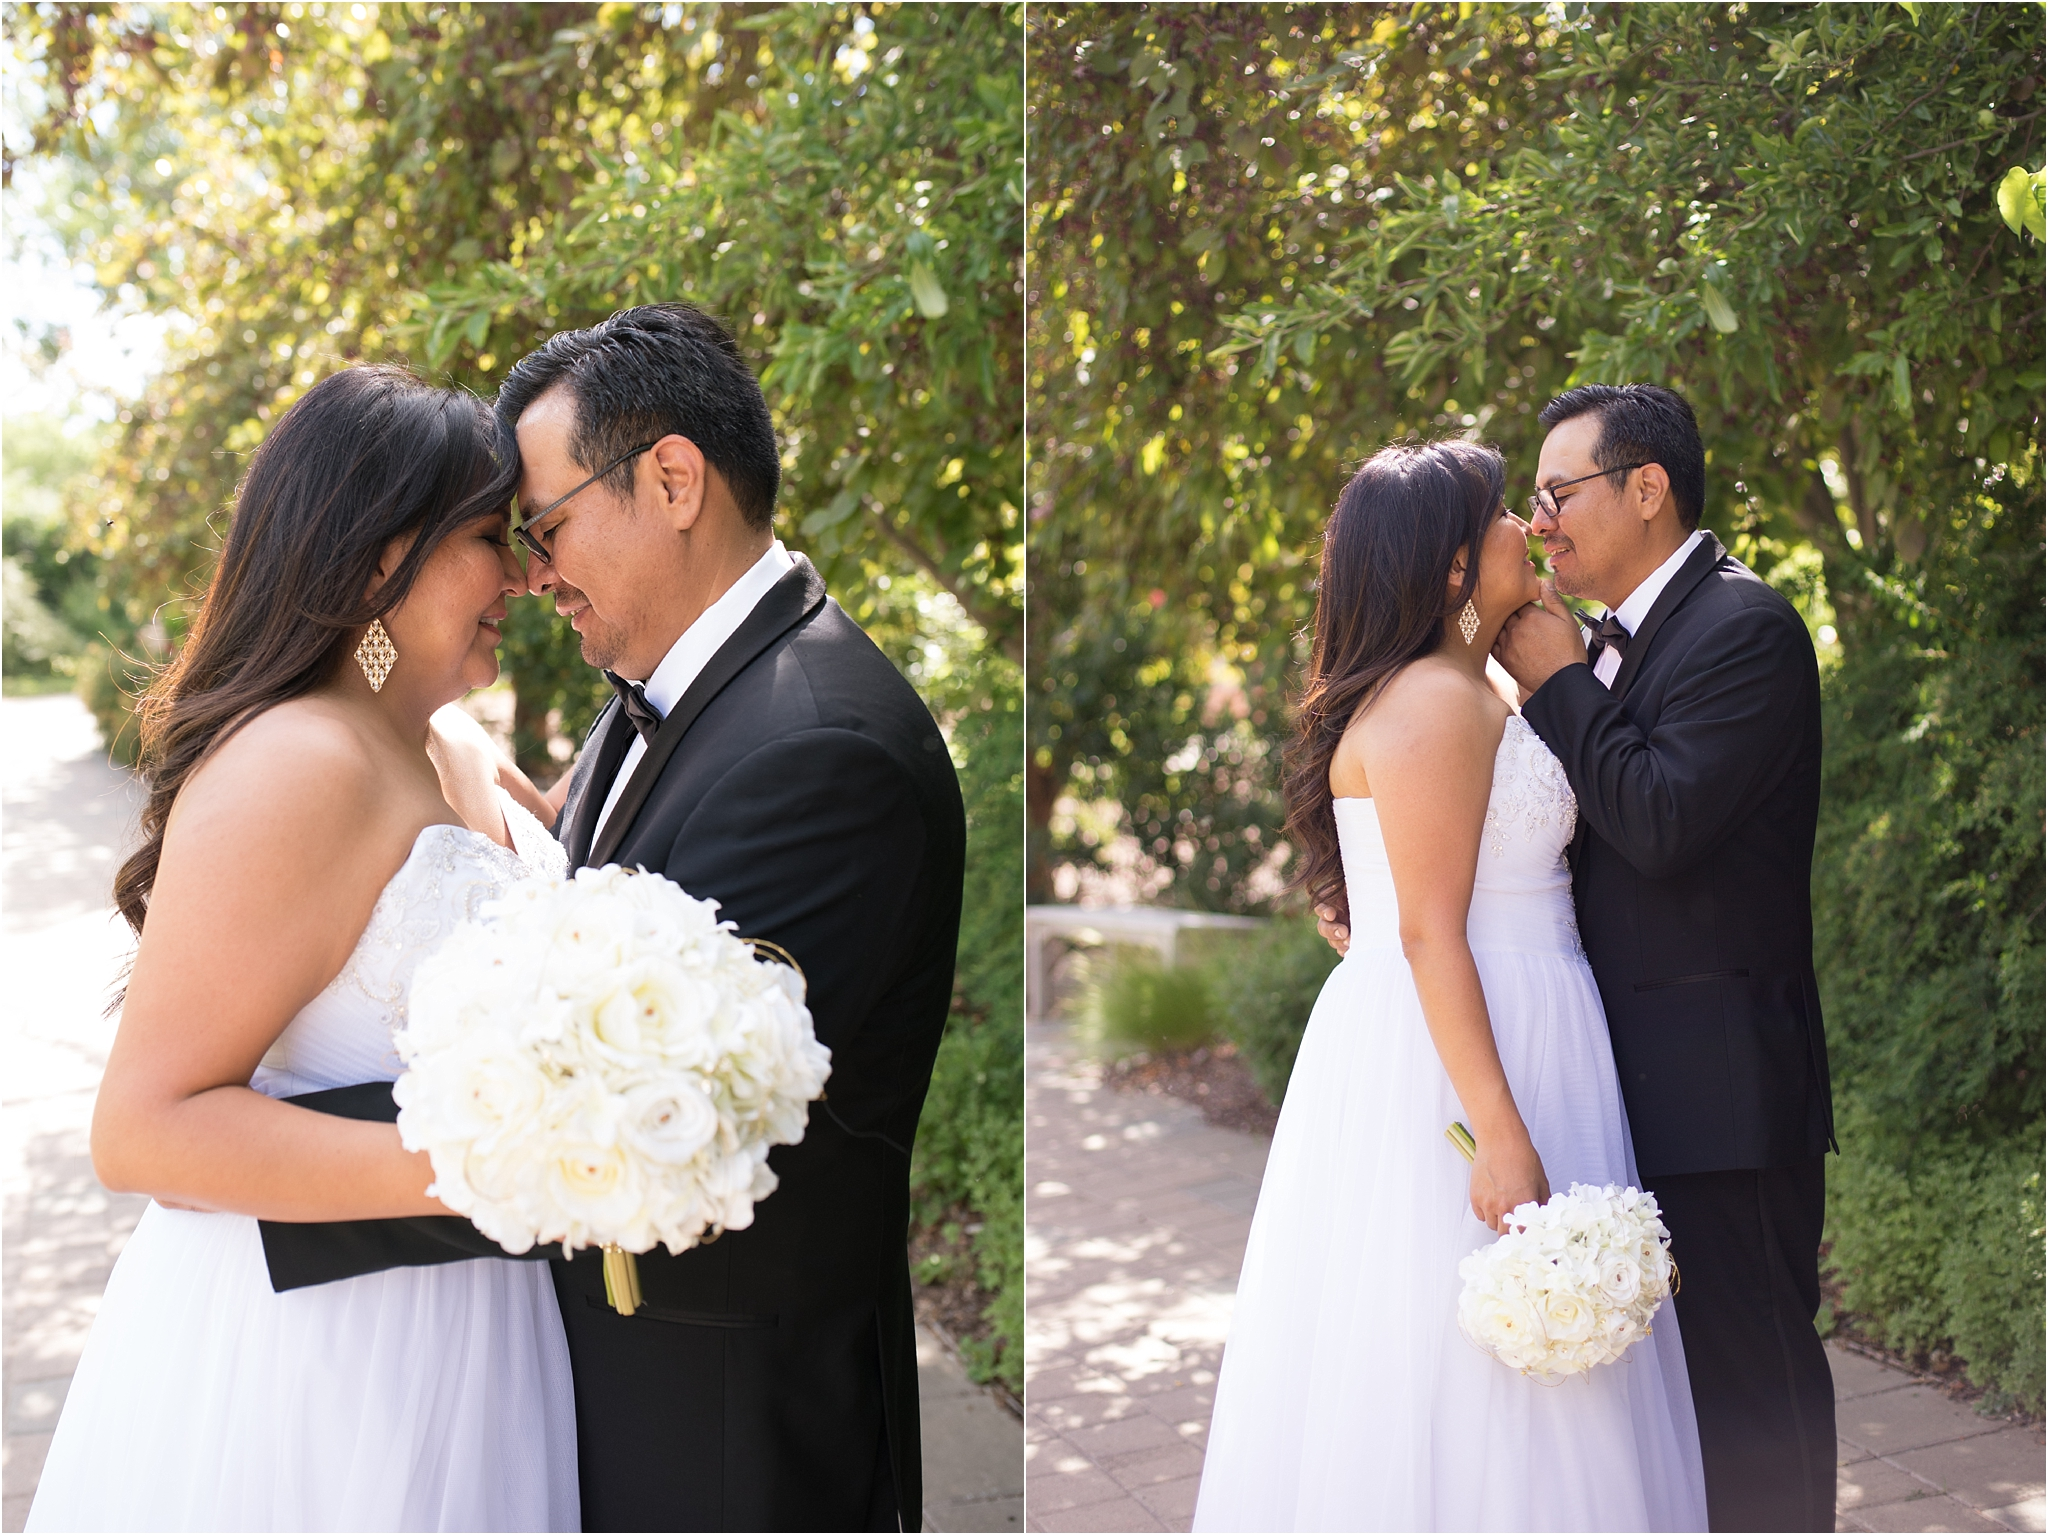 kayla kitts photography - albuquerque botanical gardens - albuquerque wedding photographer - albuquerque wedding - the banque lofts wedding_0012.jpg